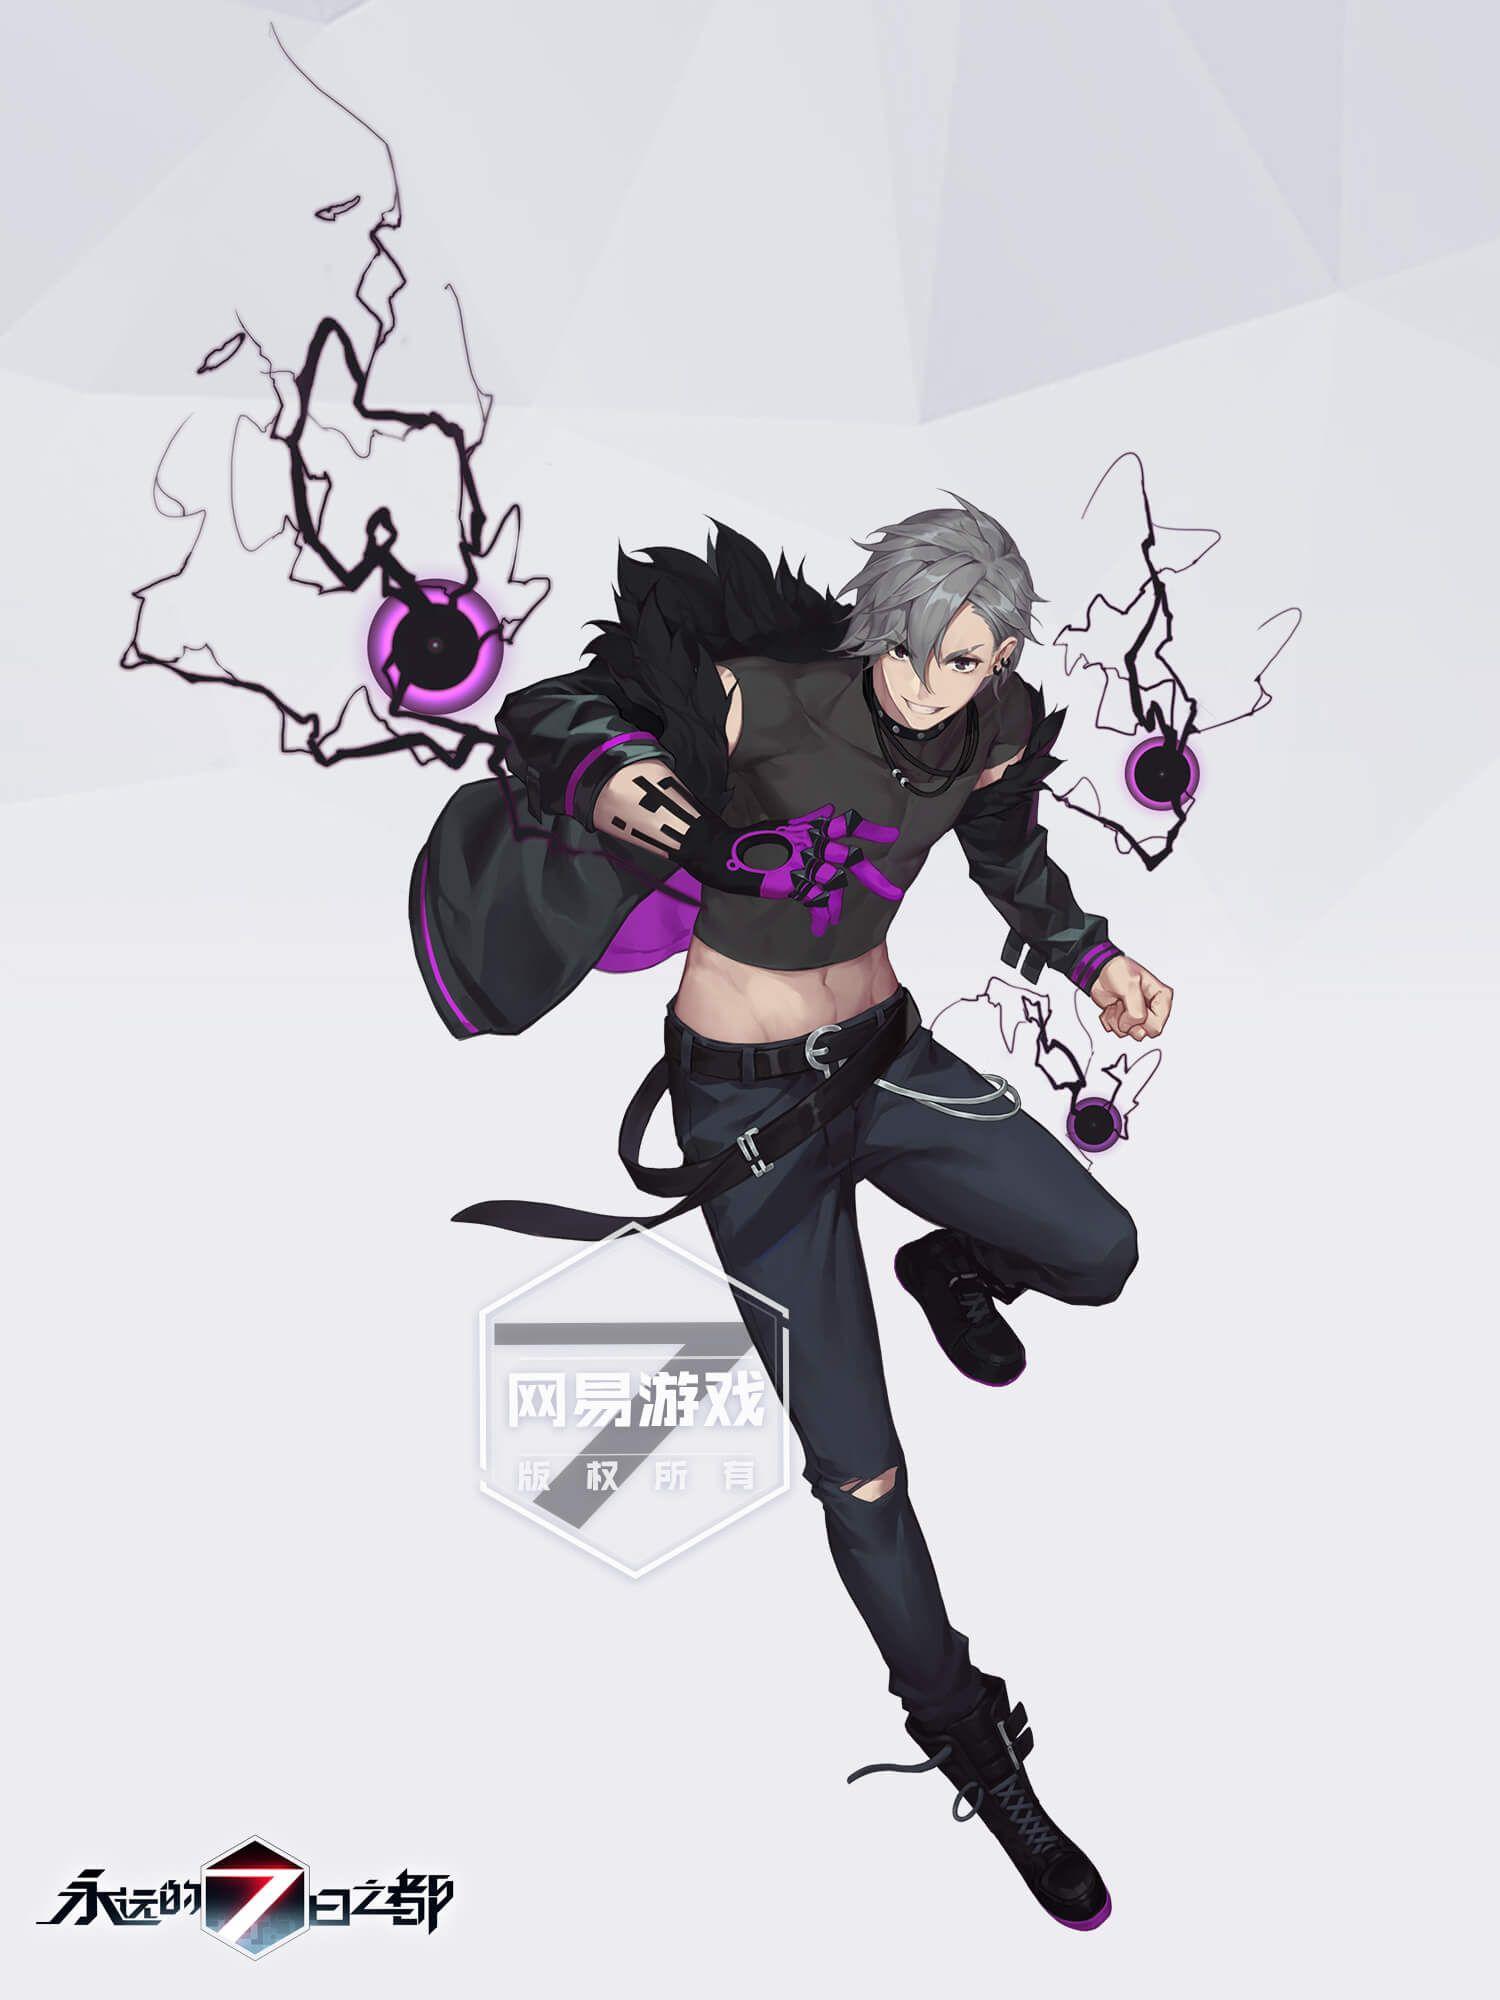 Pin By Jax On Anime Cgi Anime Character Design Game Character Design Fantasy Character Design